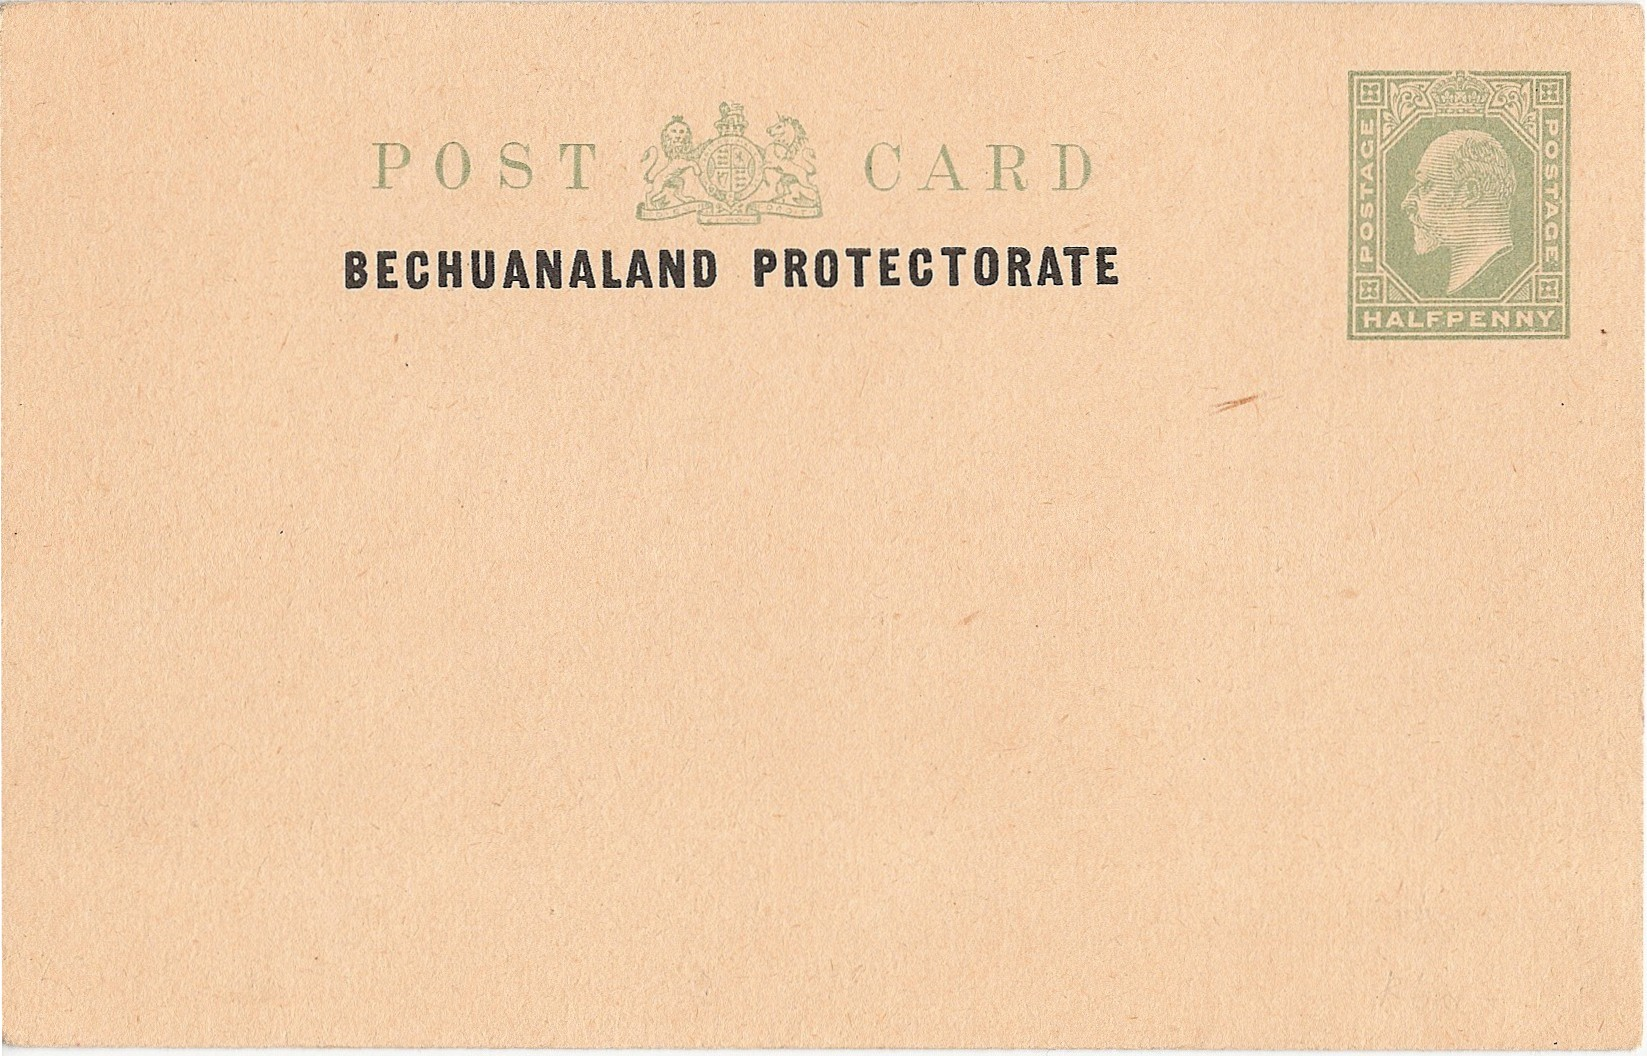 Bechuanaland Protectorate postcard E7 halfd